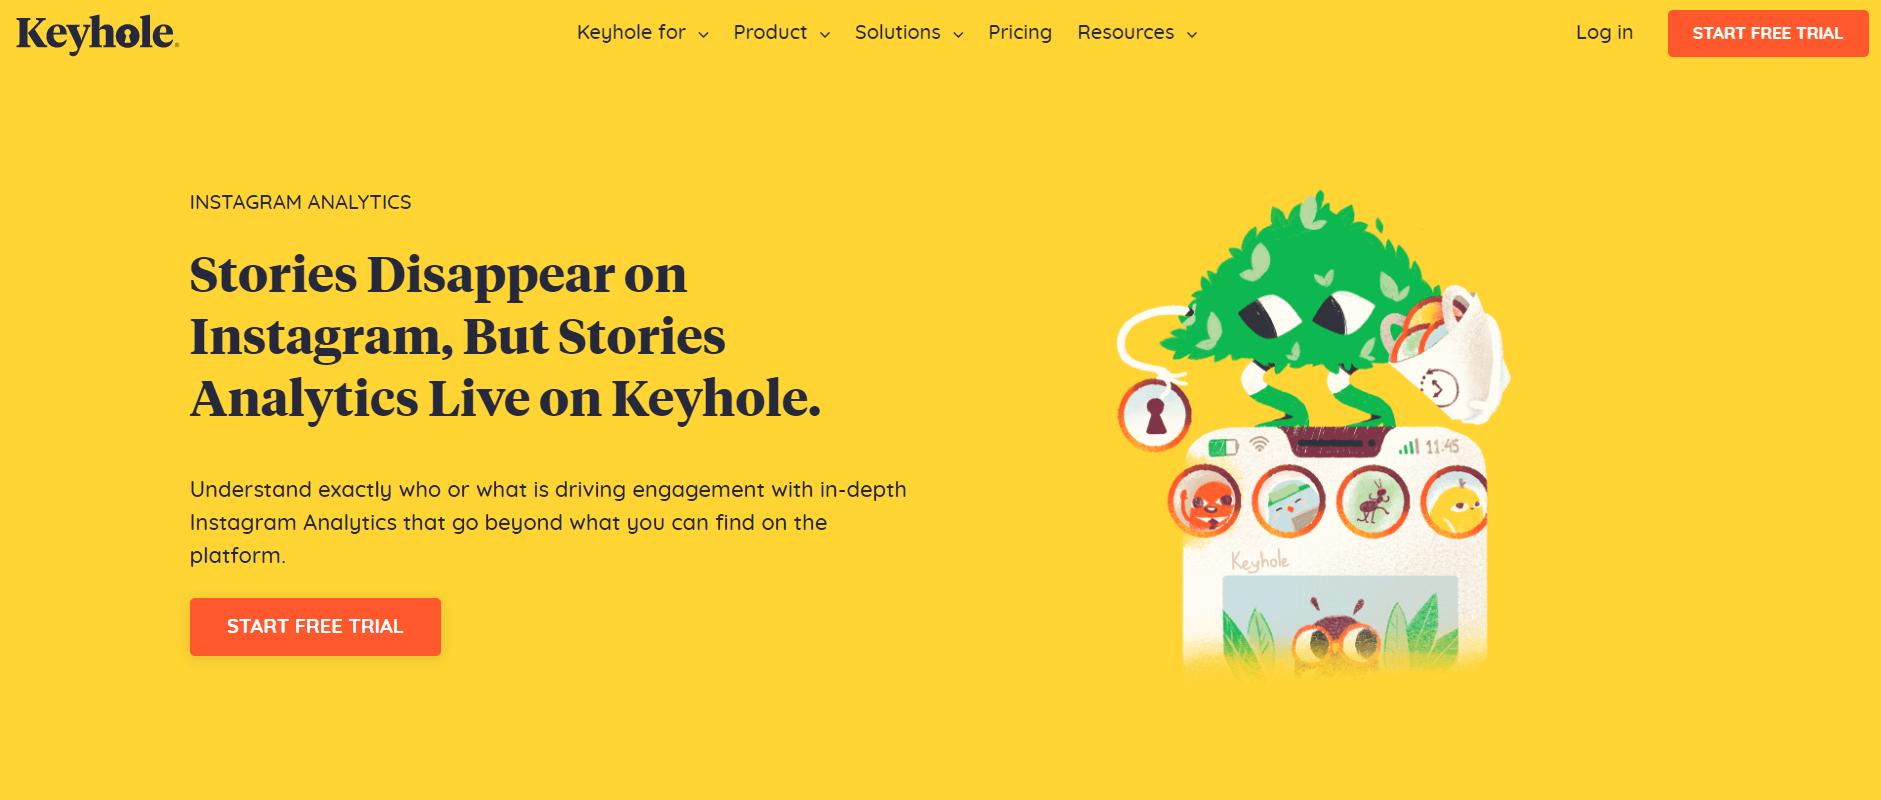 Keyhole Instagram Analytics Tool1